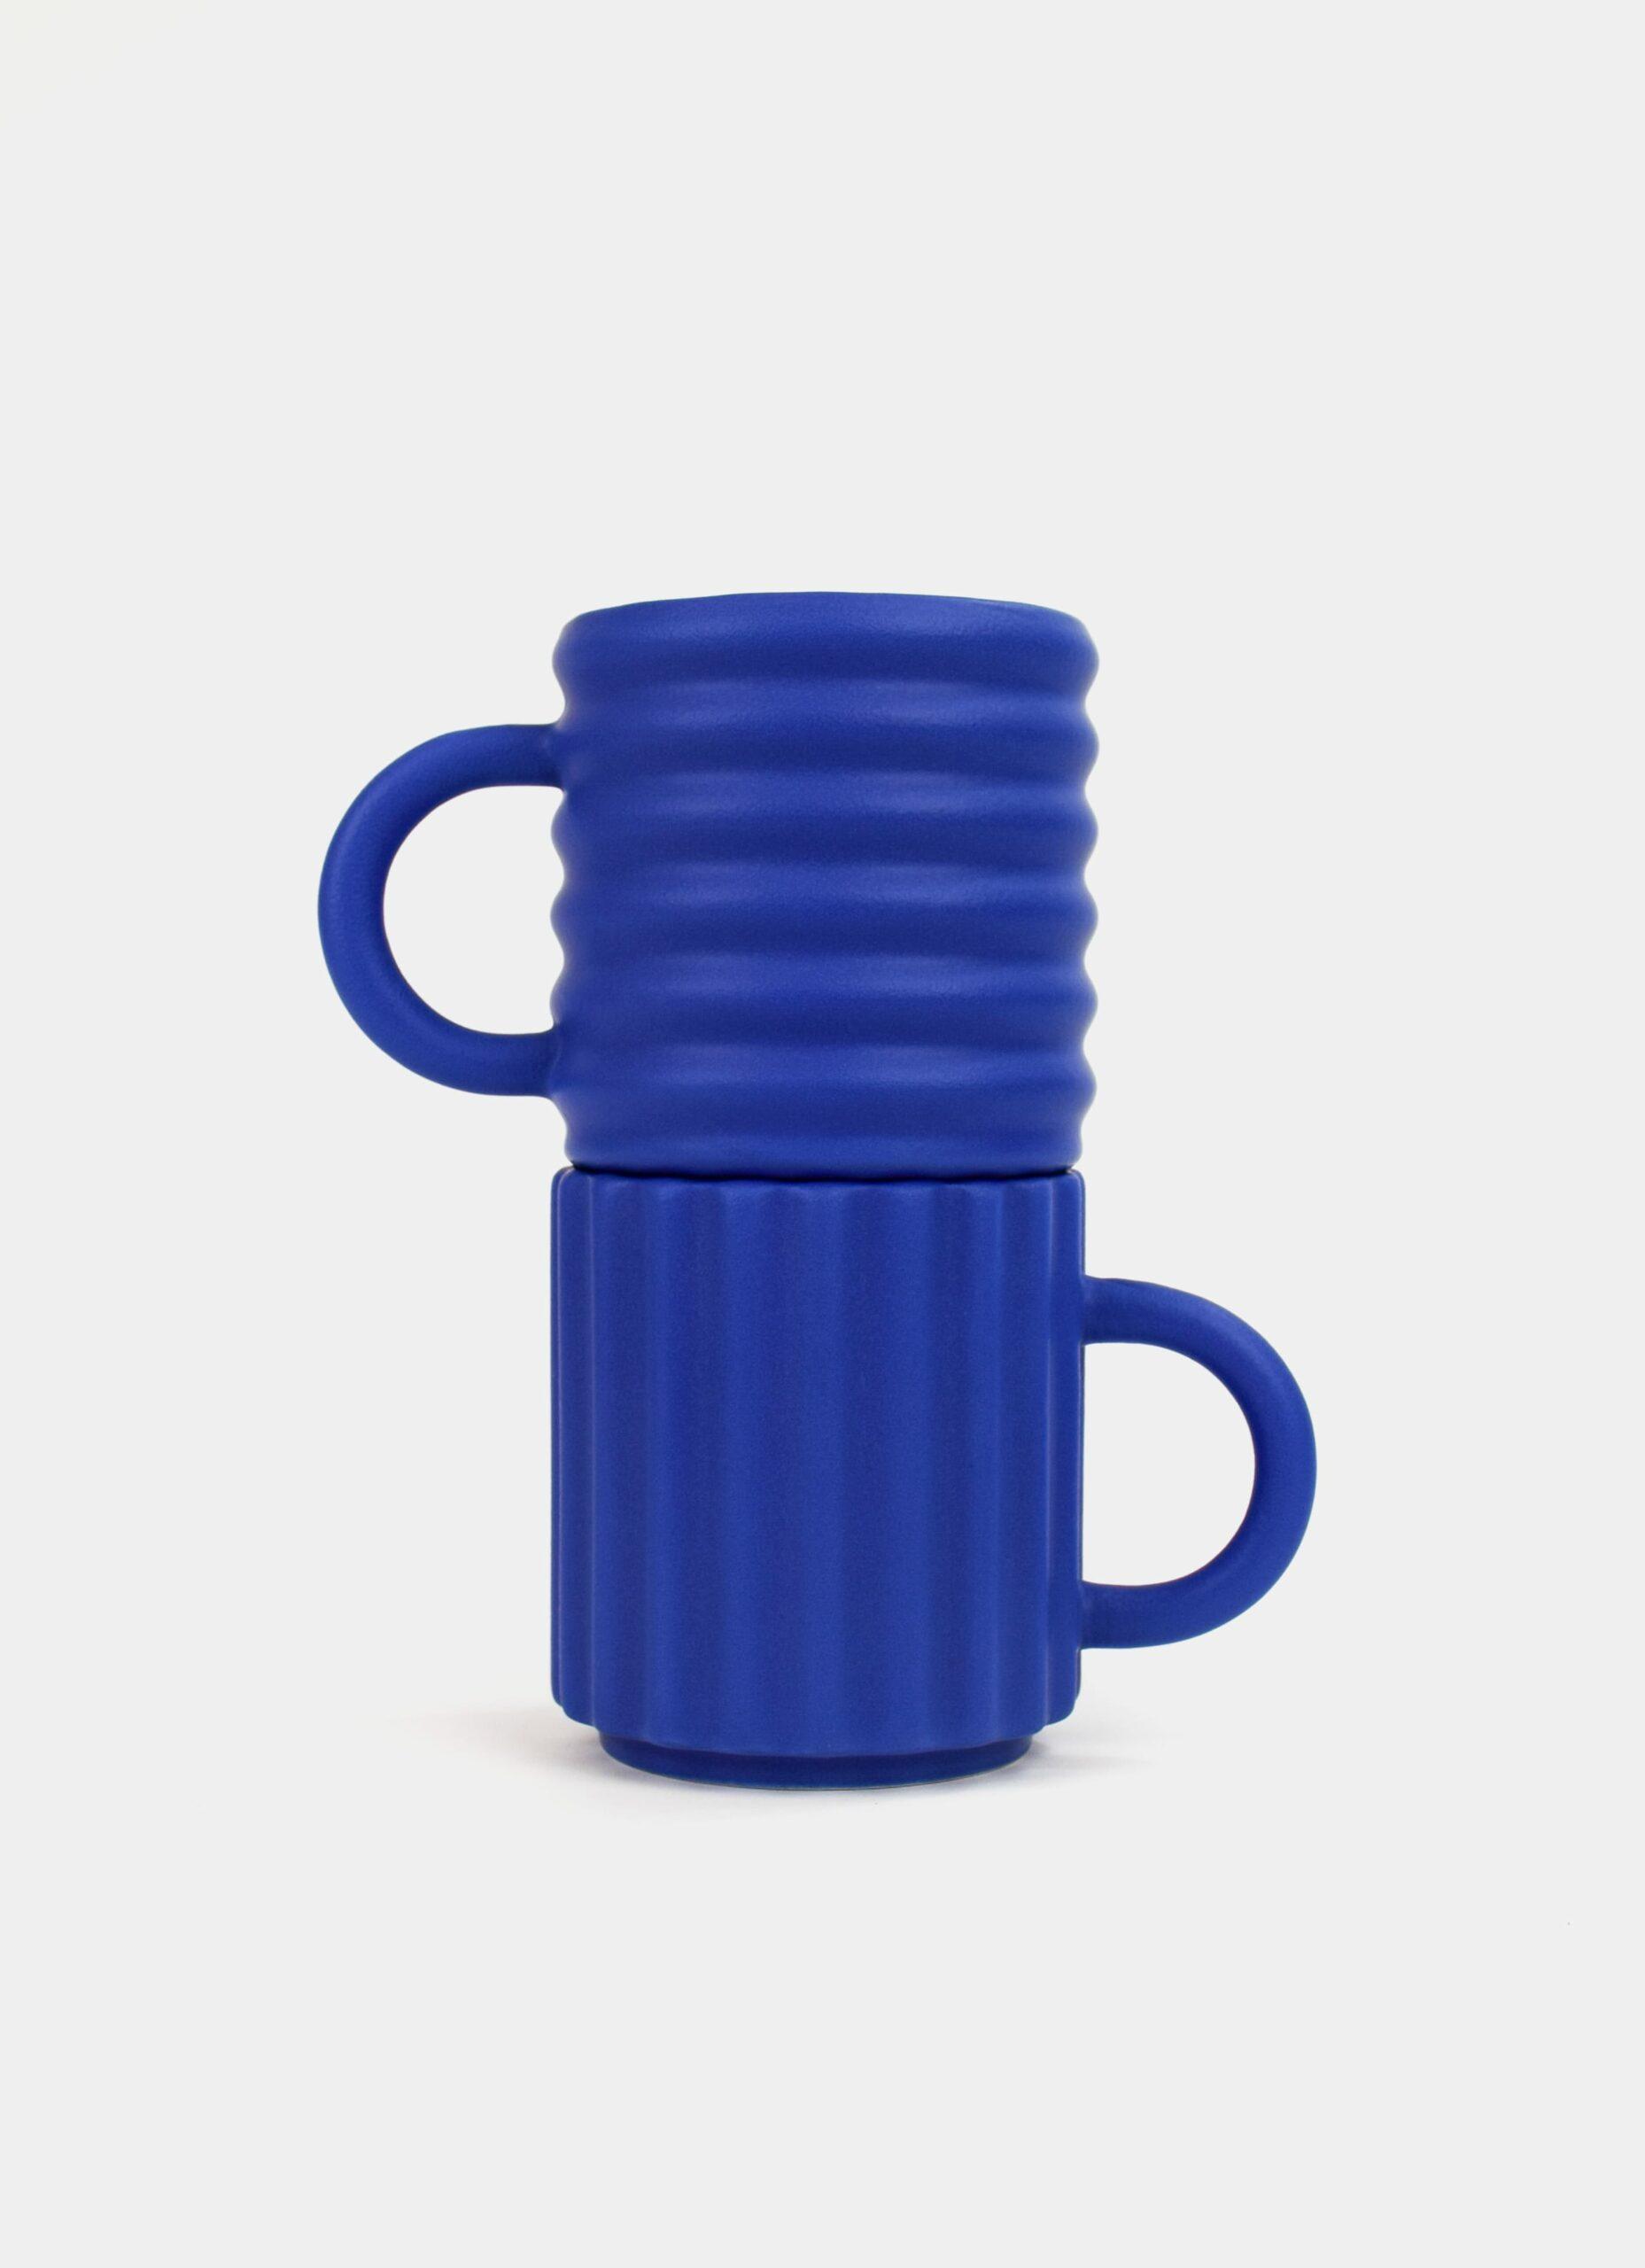 Form and Seek - Ripple Mugs - Set of Two - Cobalt